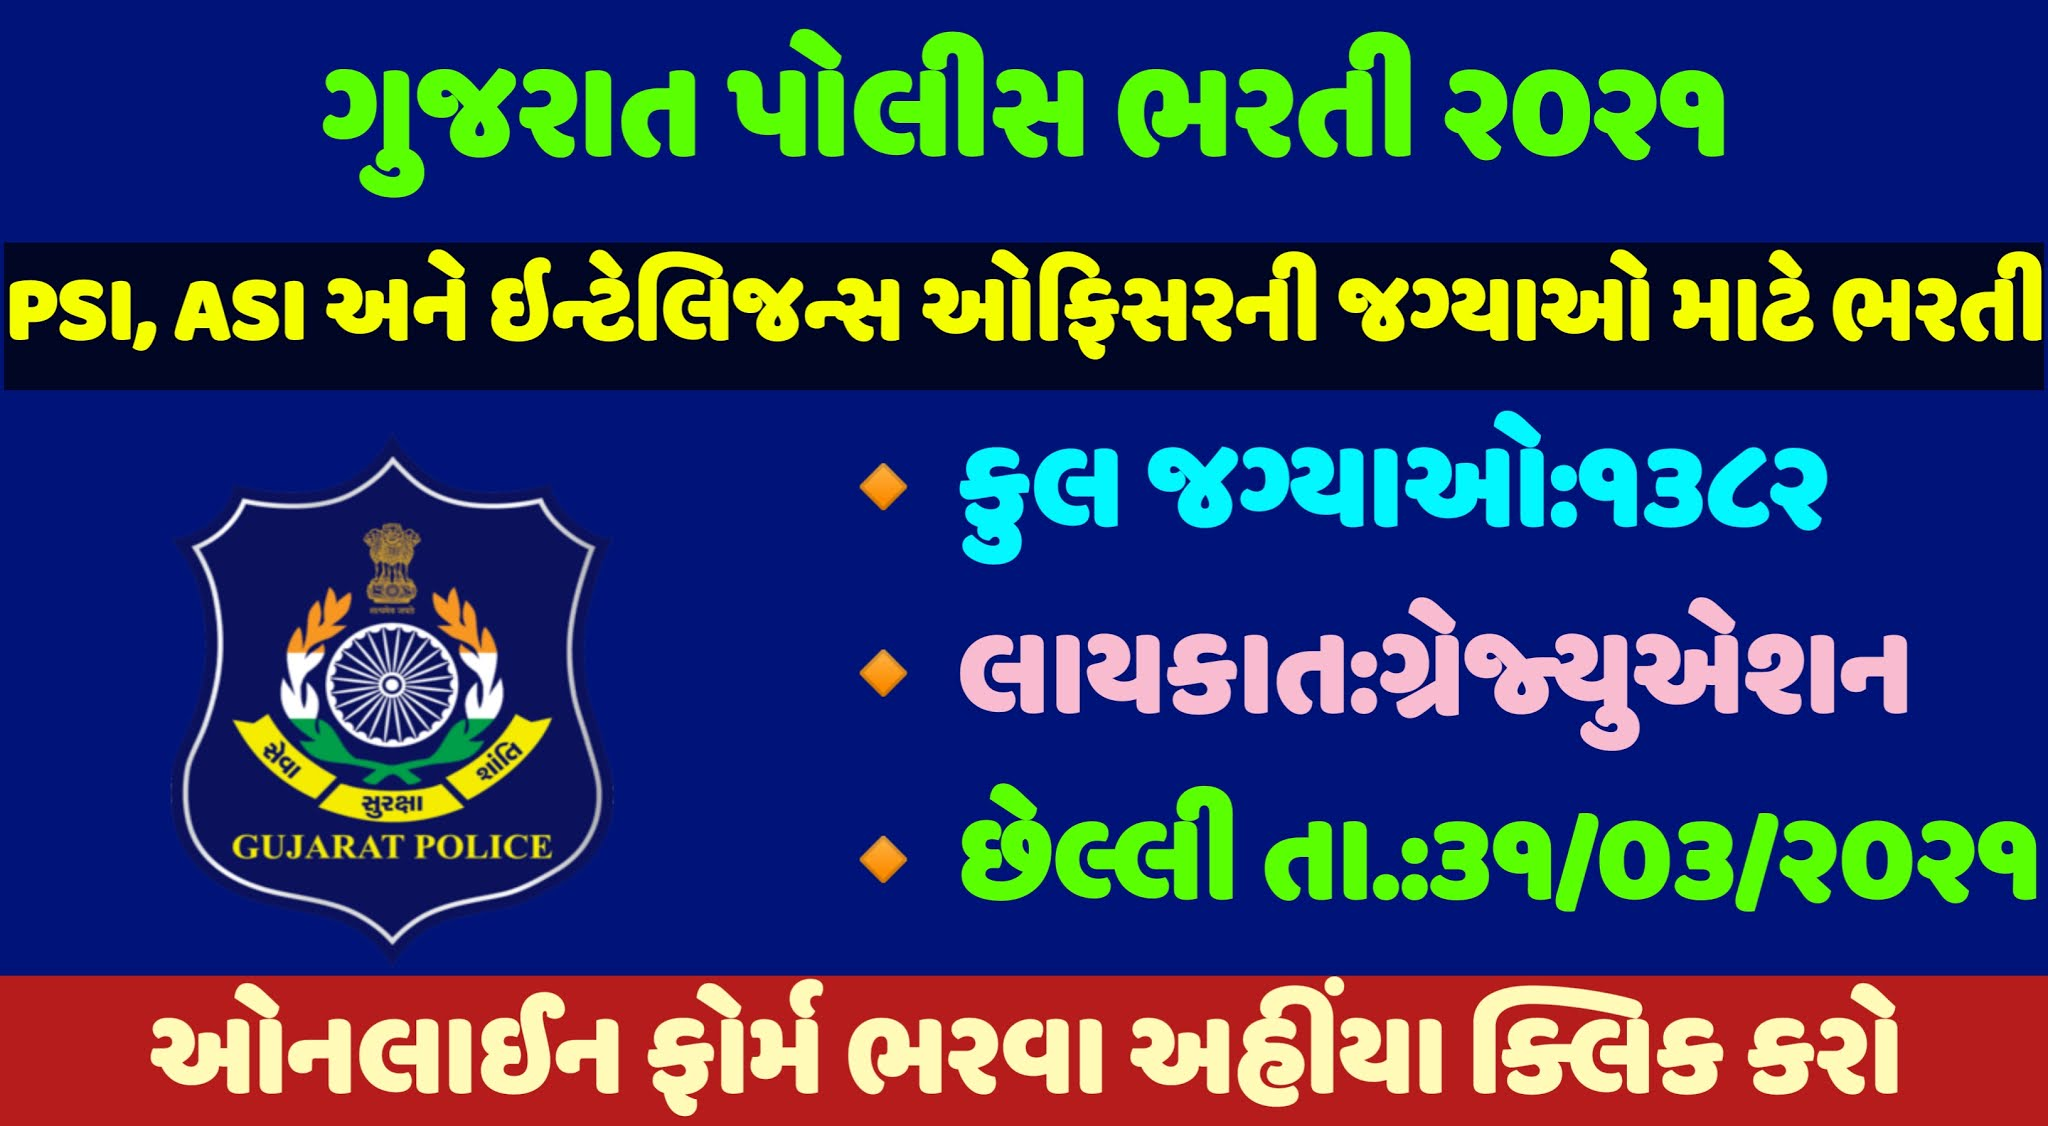 Gujarat police bharti 2021, gujarat police recruitment 2021,gujarat police bharti 2021 notification, gujarat police bharti 2021 syllabus,gujarat police vacancy 2021,www.police.gujarat.gov.in 2021,police bharati 2021 apply online,gujarat police bharti 2021 official website